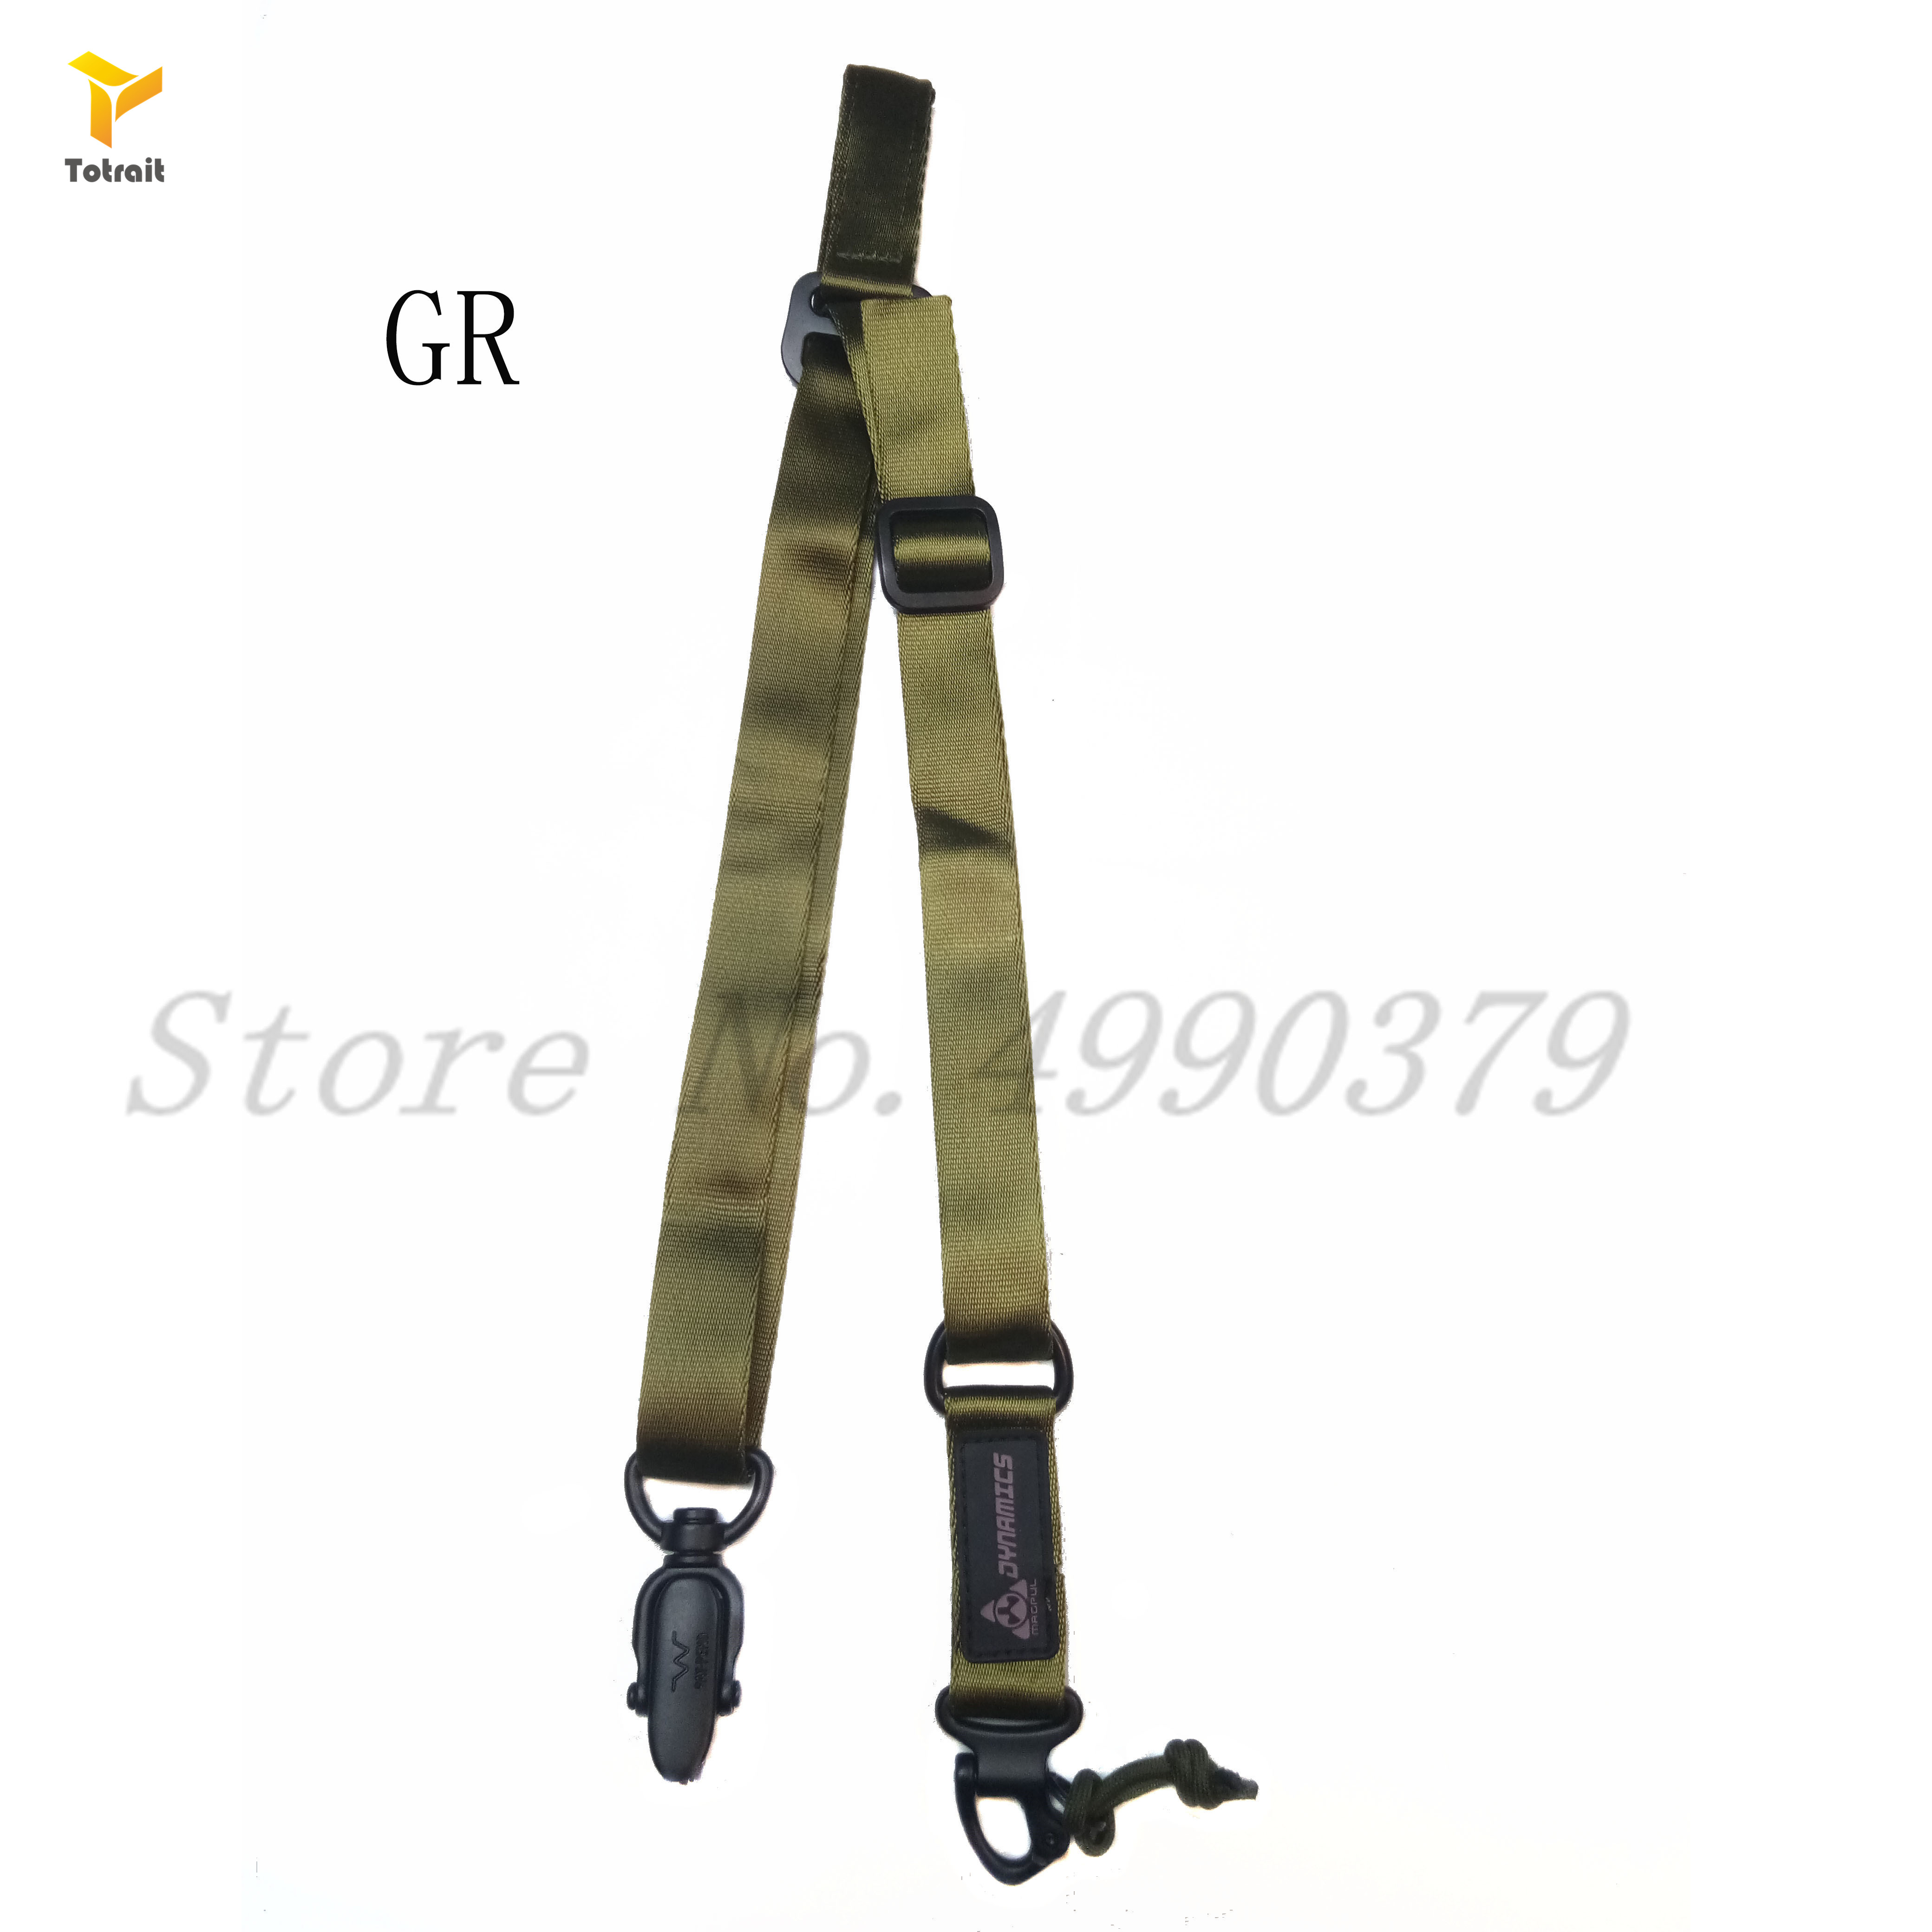 1 Pcs Tactical Multi-Mission Rifle Sling Gun Strap System Mount Set Suitable for MS2